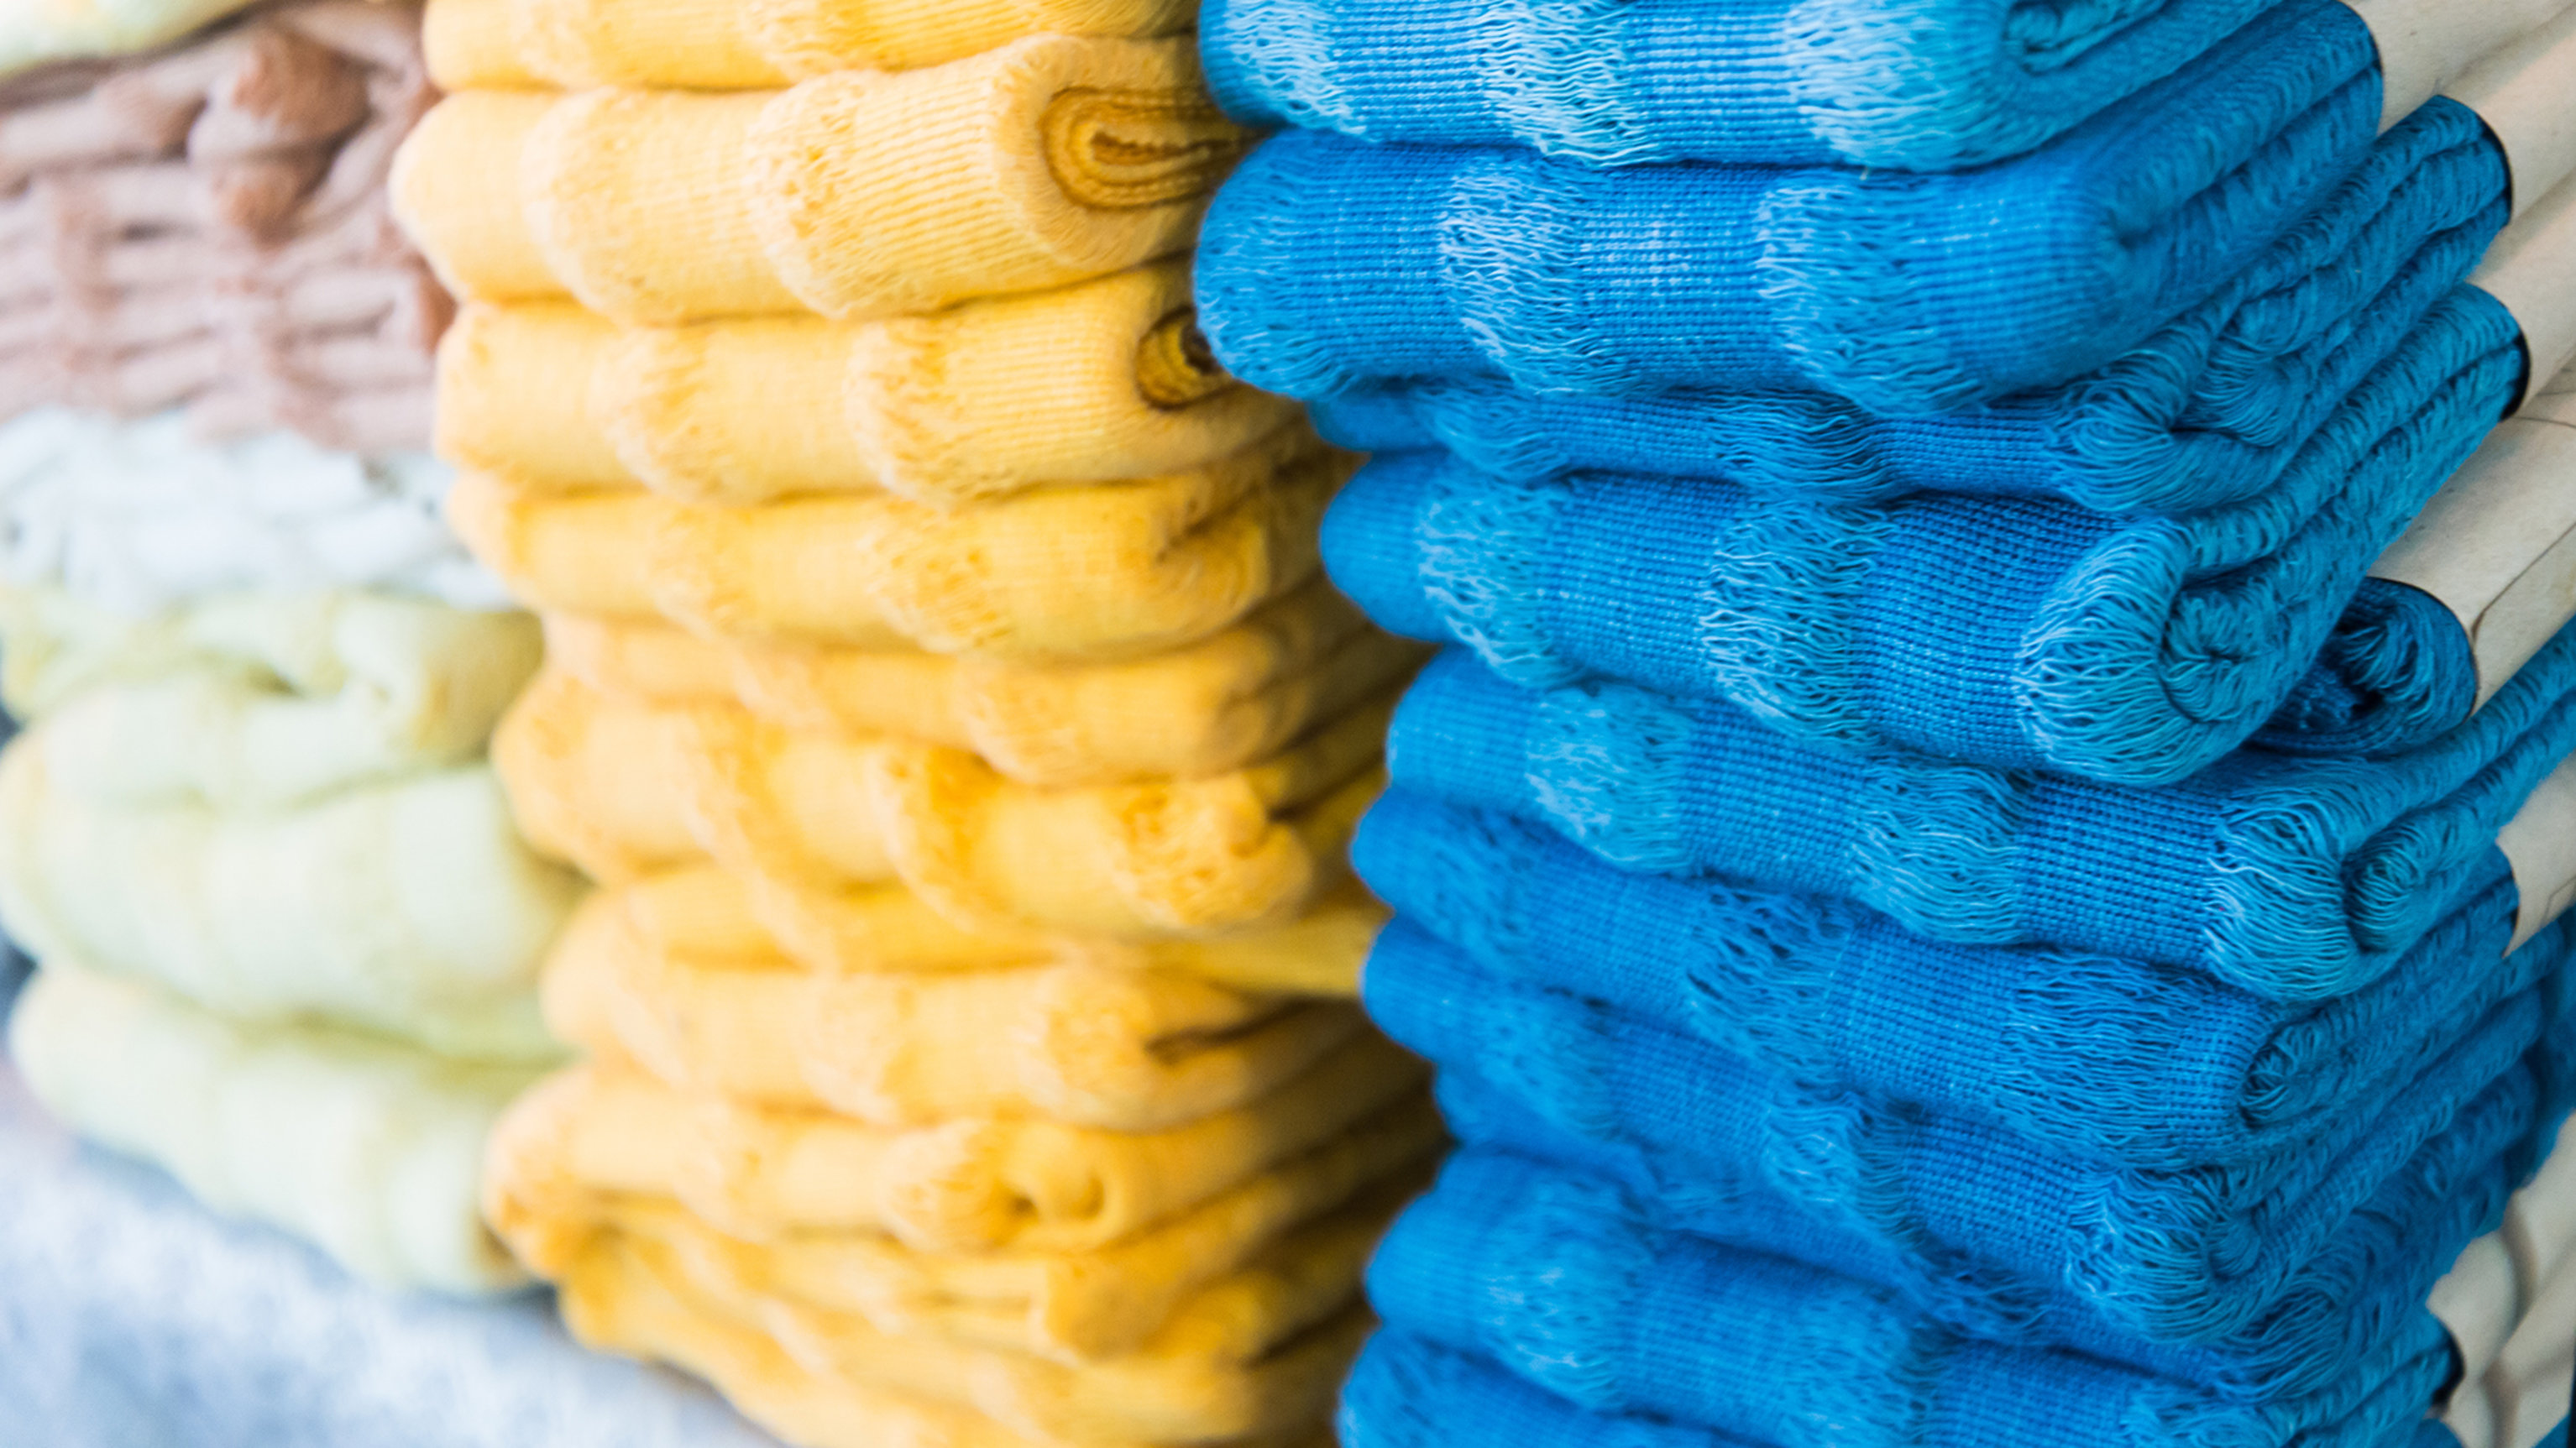 Stockfoto: Calvatis Textilpflege - © istock.com / mcmaster639